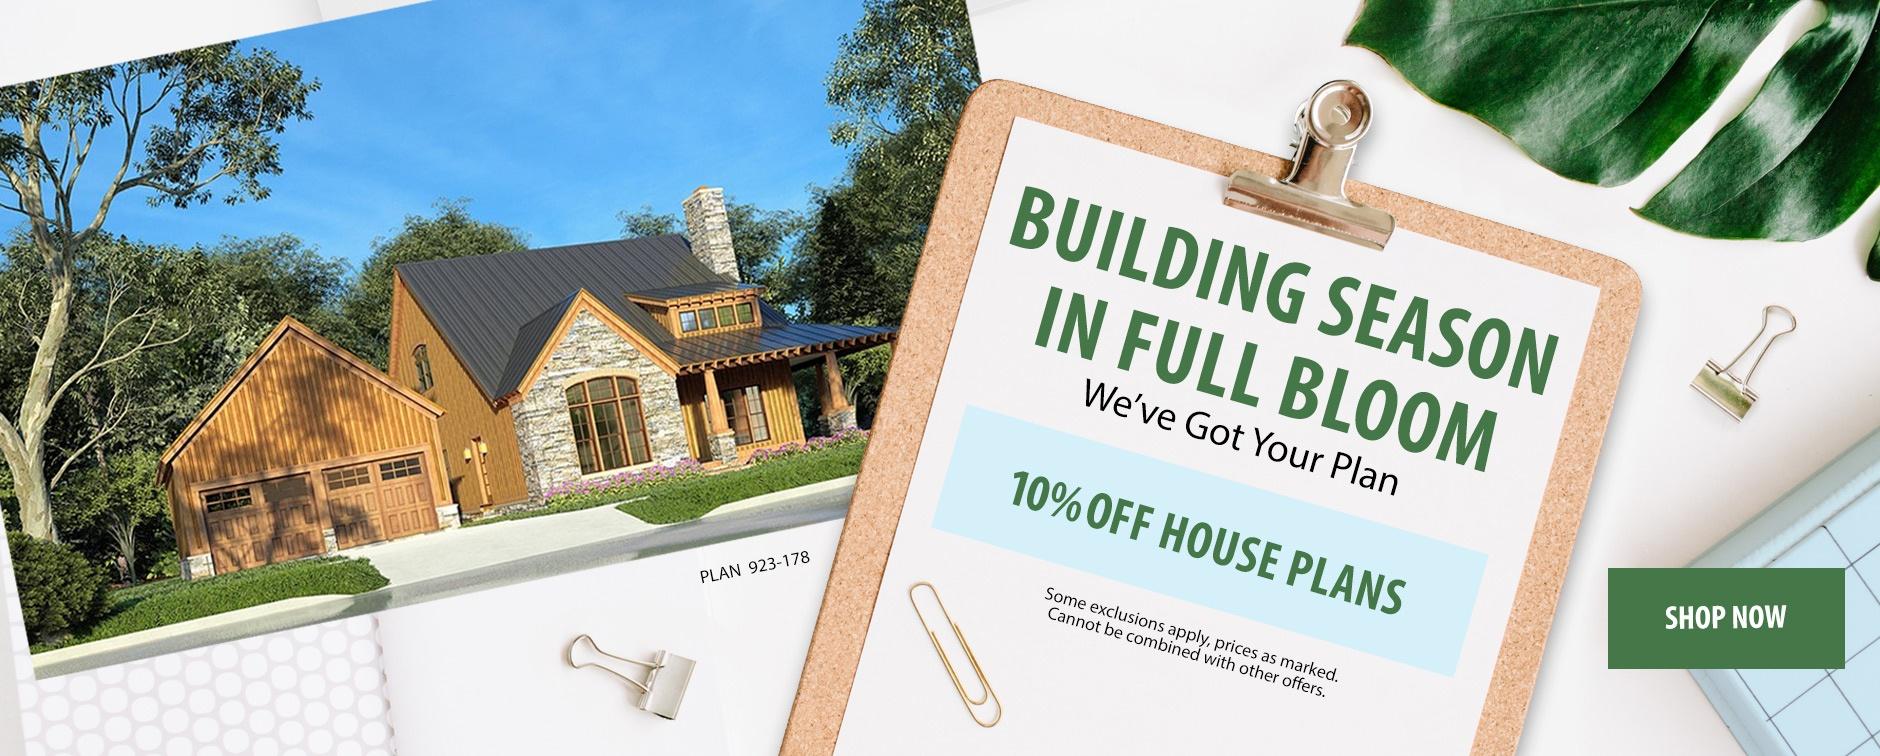 April Home Plan Sale Happening Now